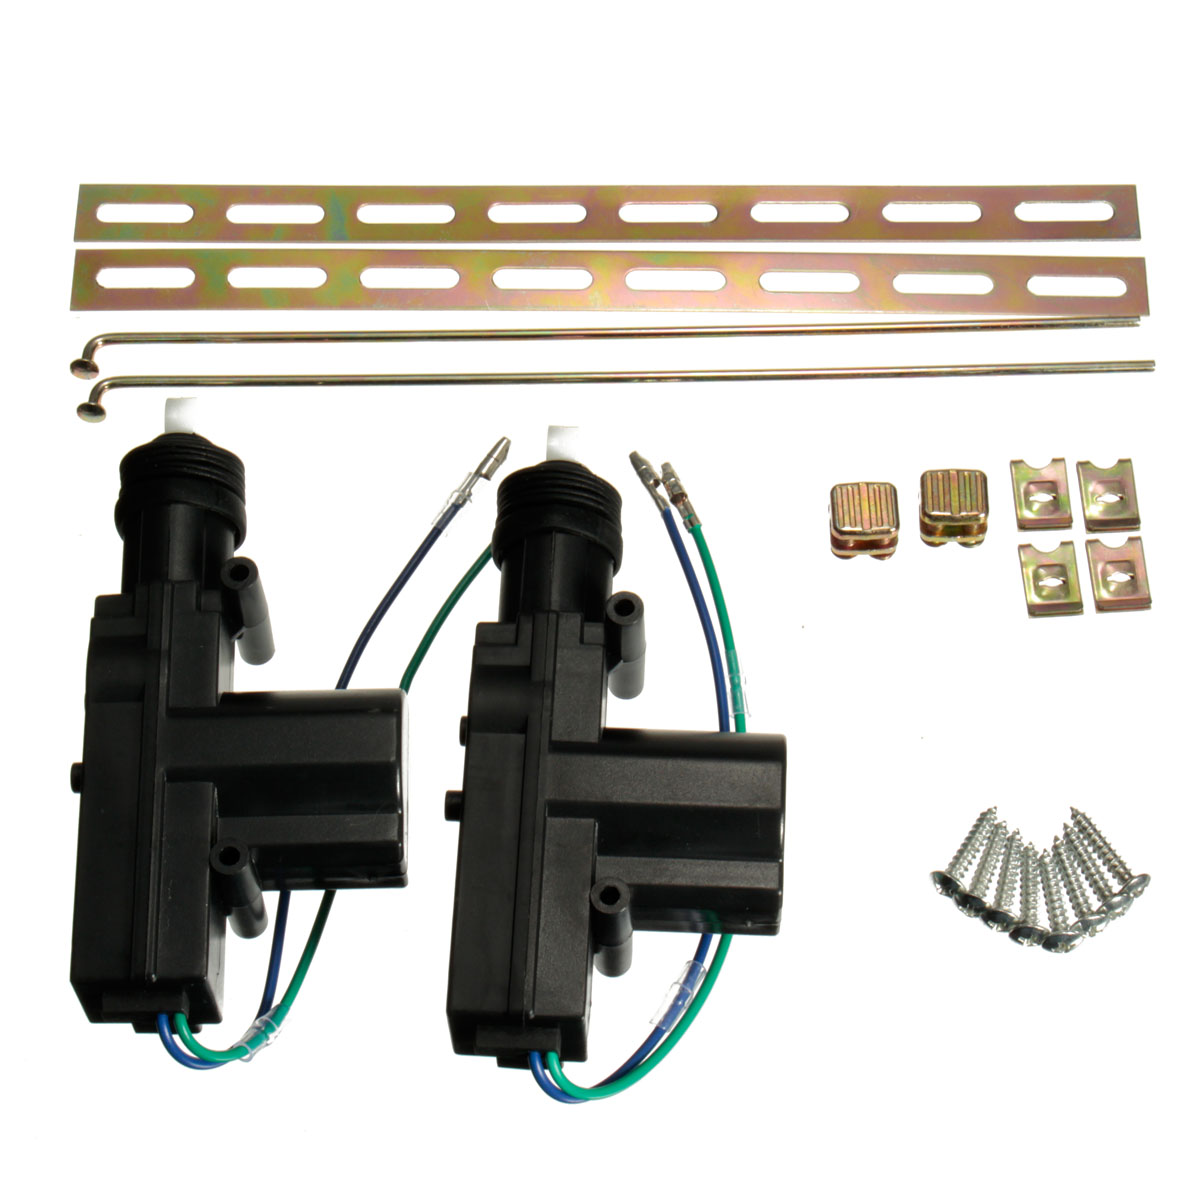 1 set dc 12v 2 wire universal car auto truck heavy duty for 12vdc door lock actuator